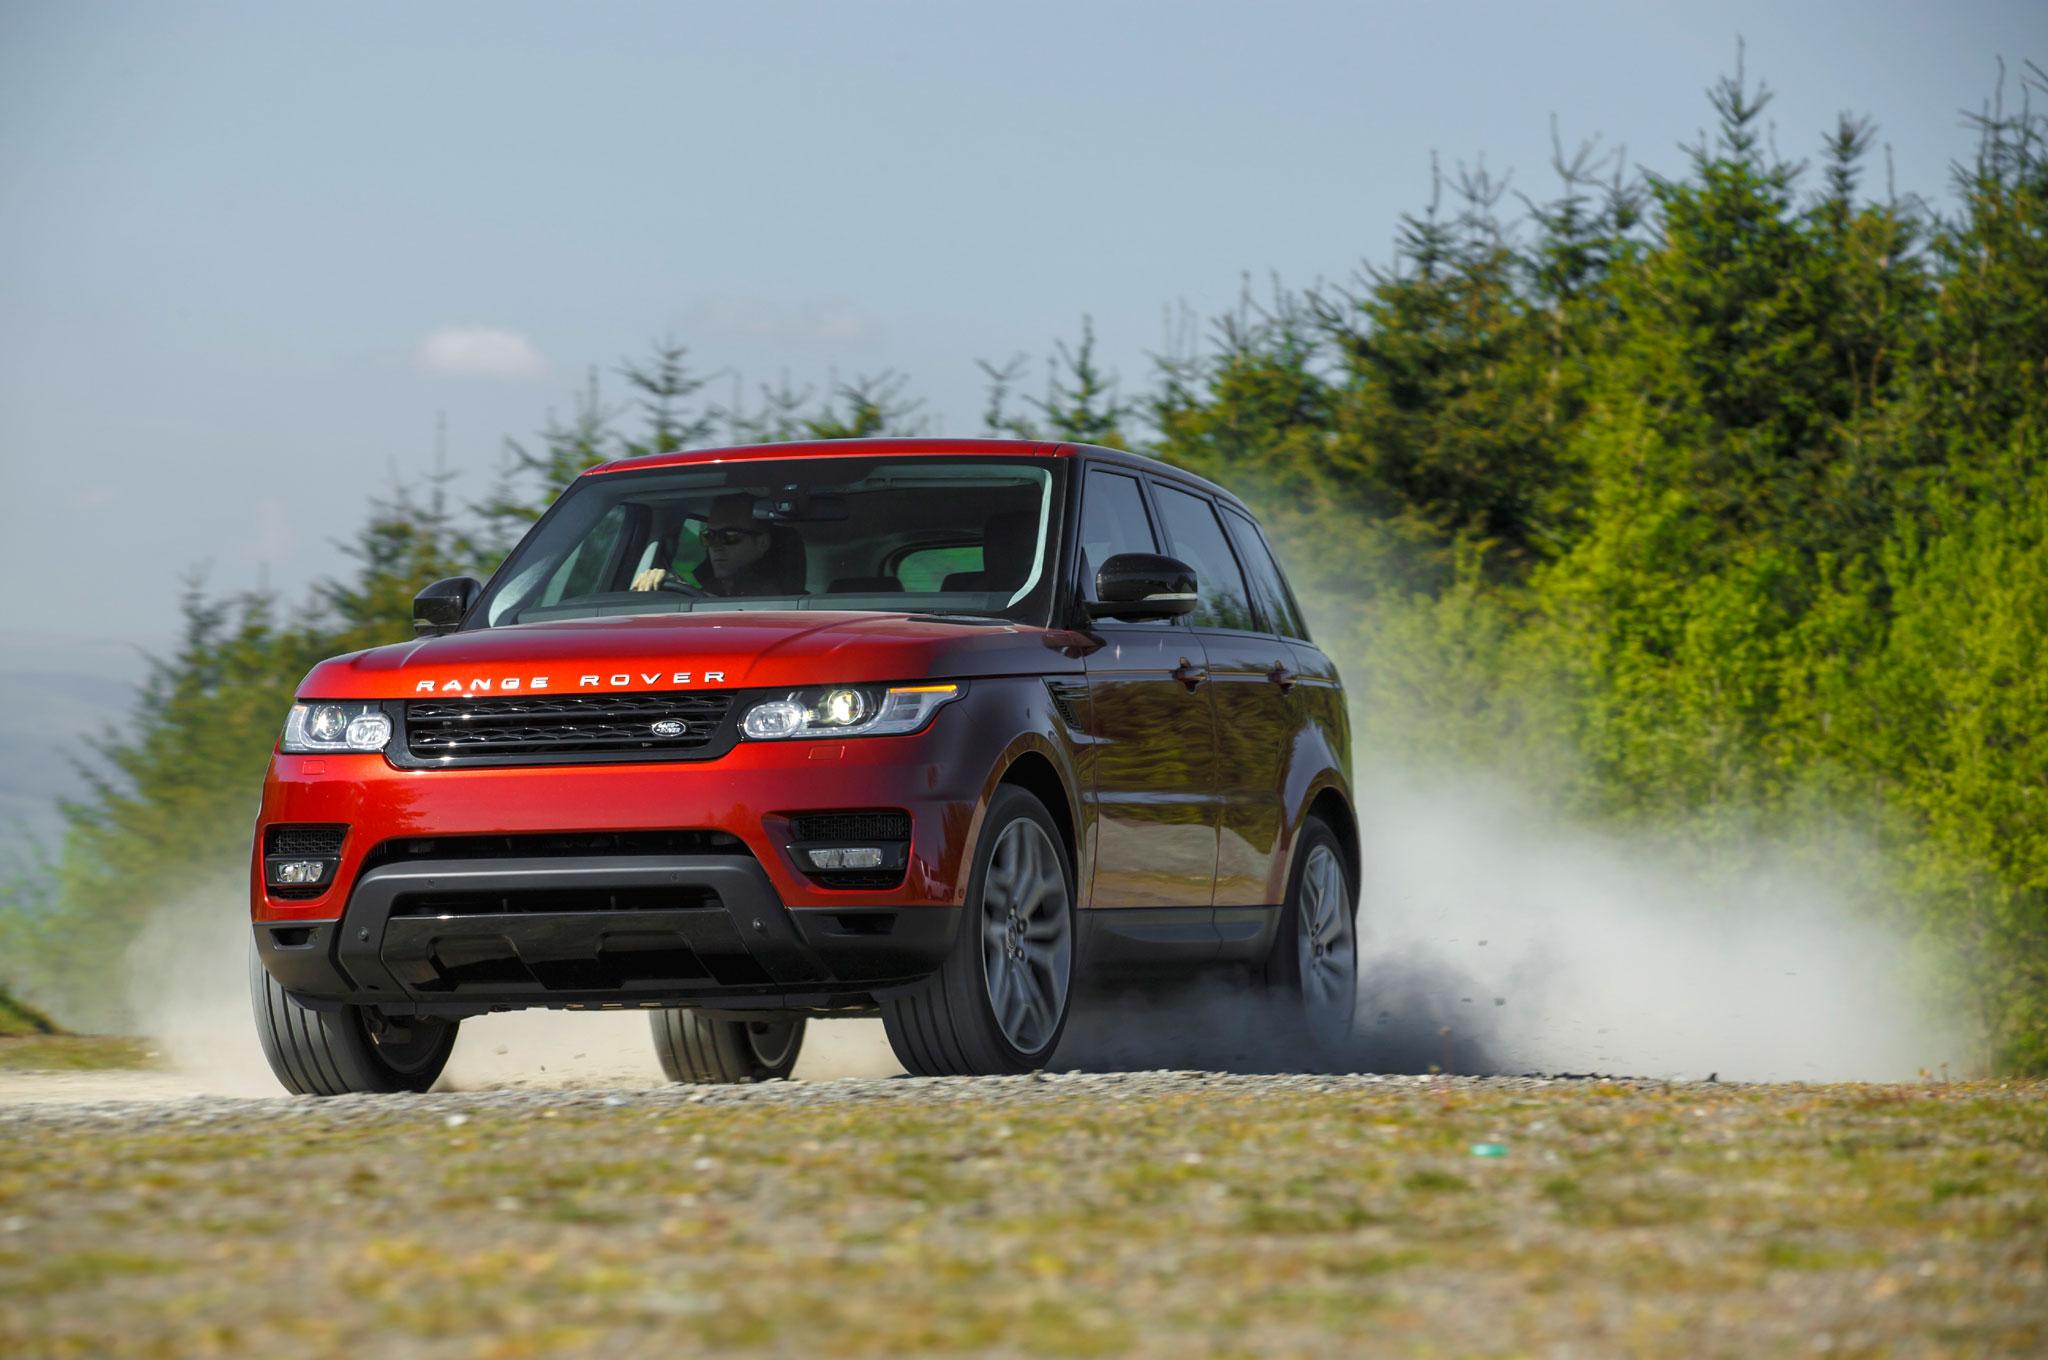 2014 Land Rover Range Sport Driven Logic 7 Wiring Diagram 24